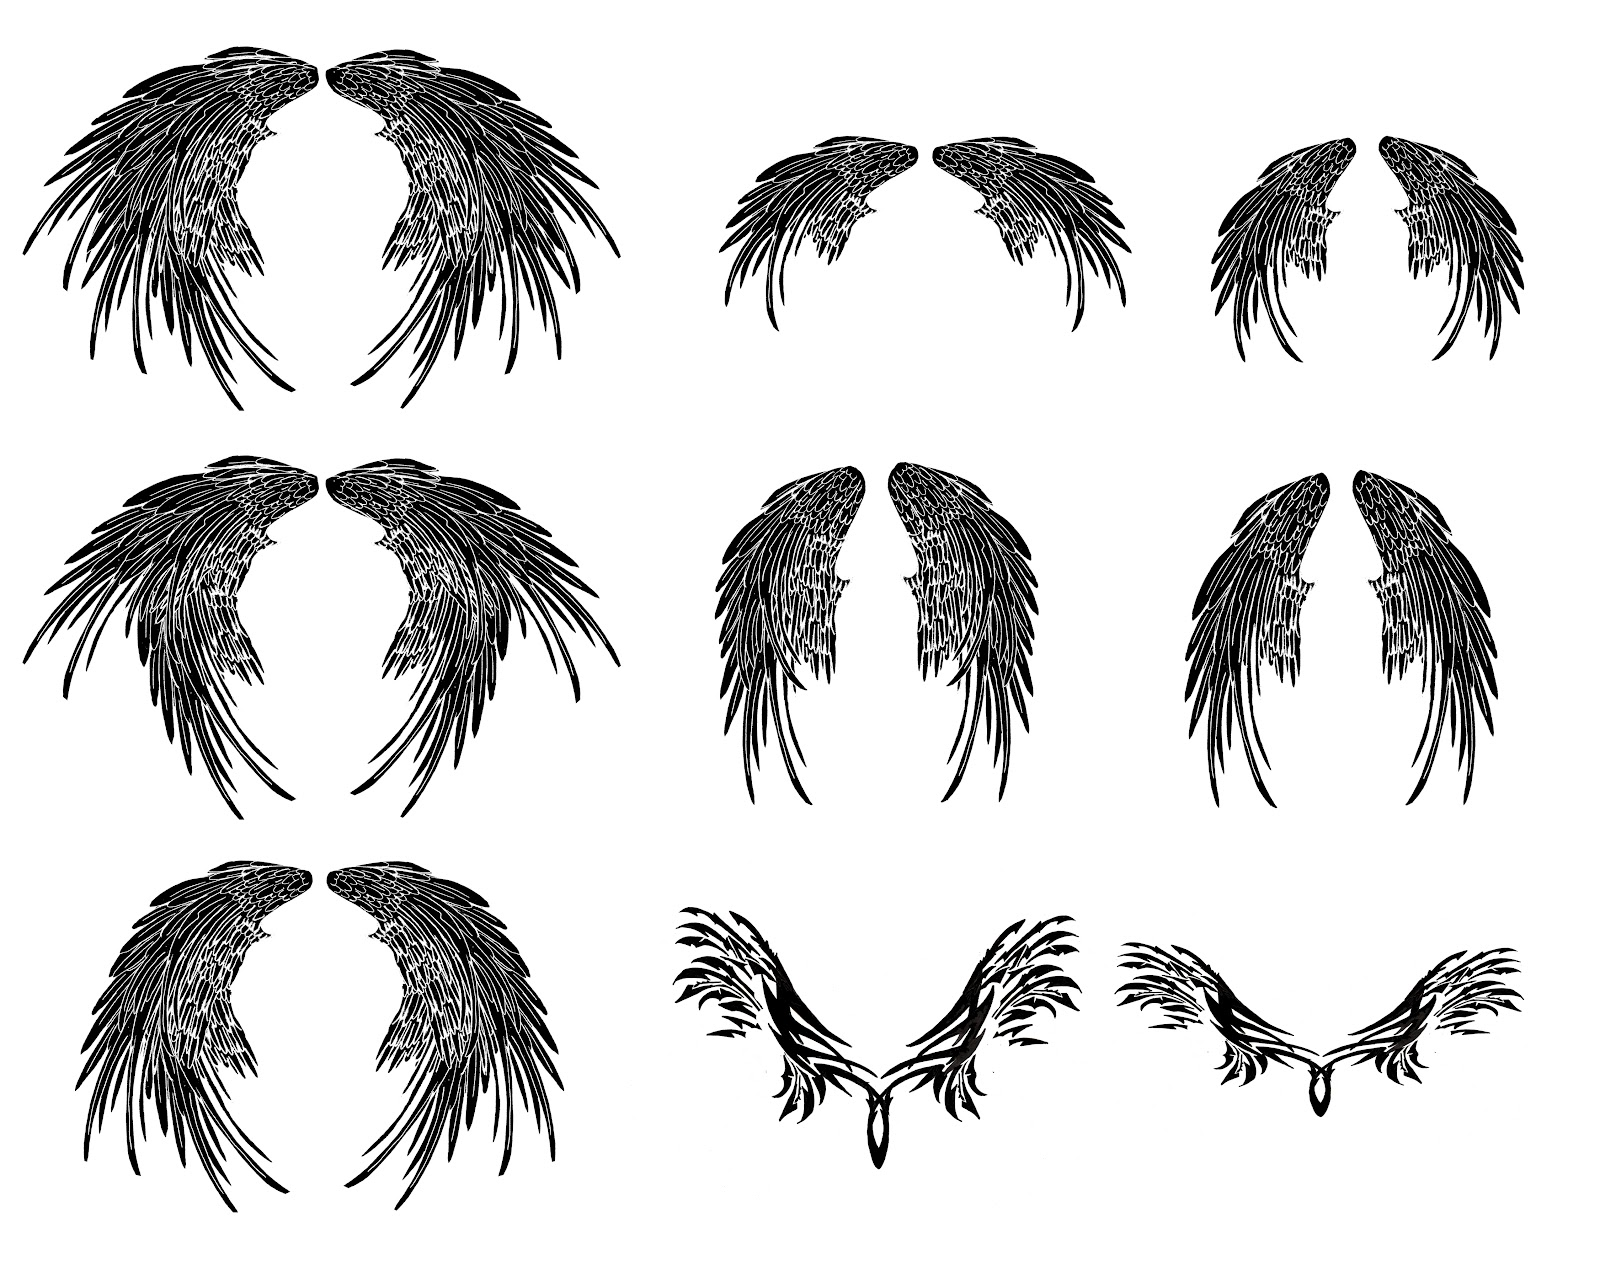 Magakhmer Tribal Angel Wings Tattoos